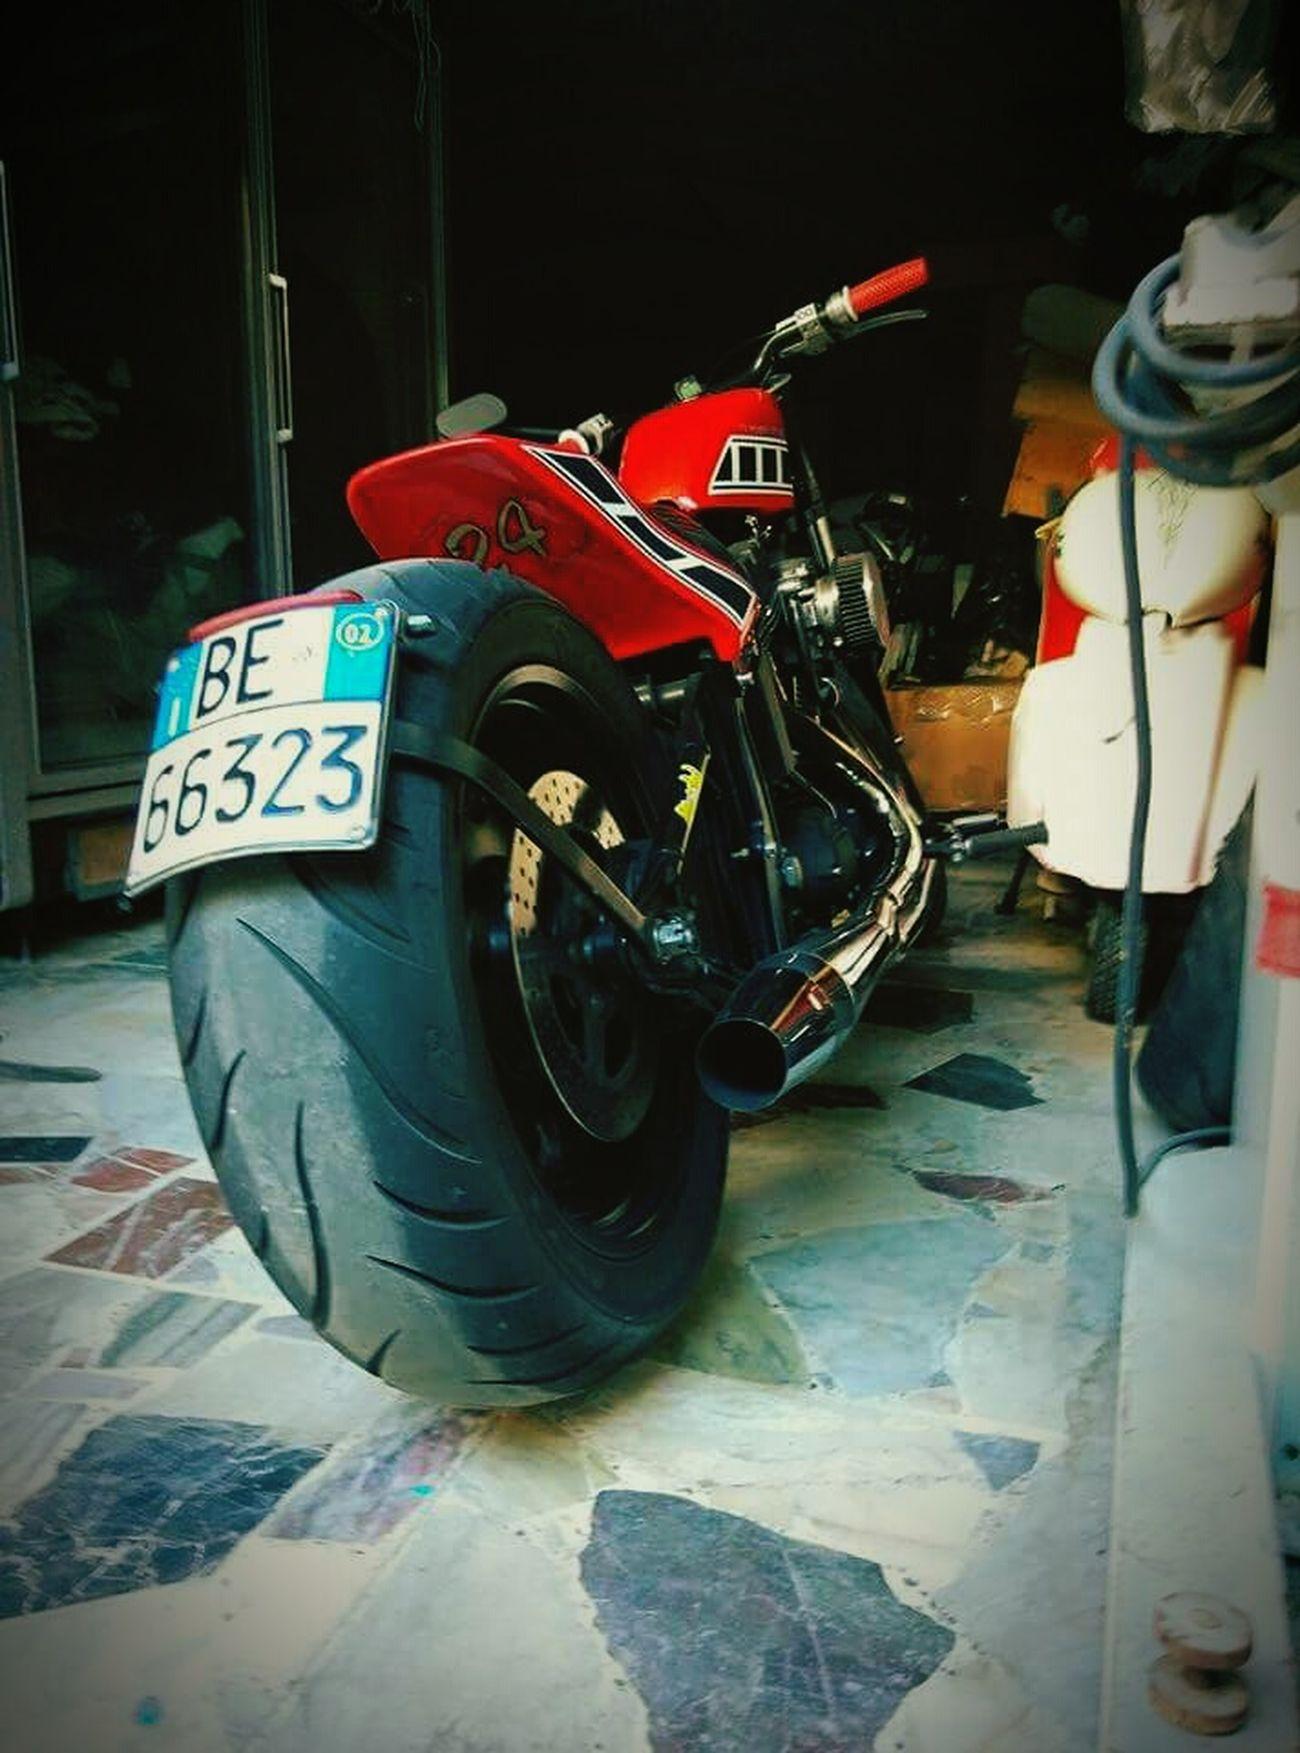 Harley Davidson Racer Kustomkulture Daily Ride Handmade Bikeporn Motorcycle